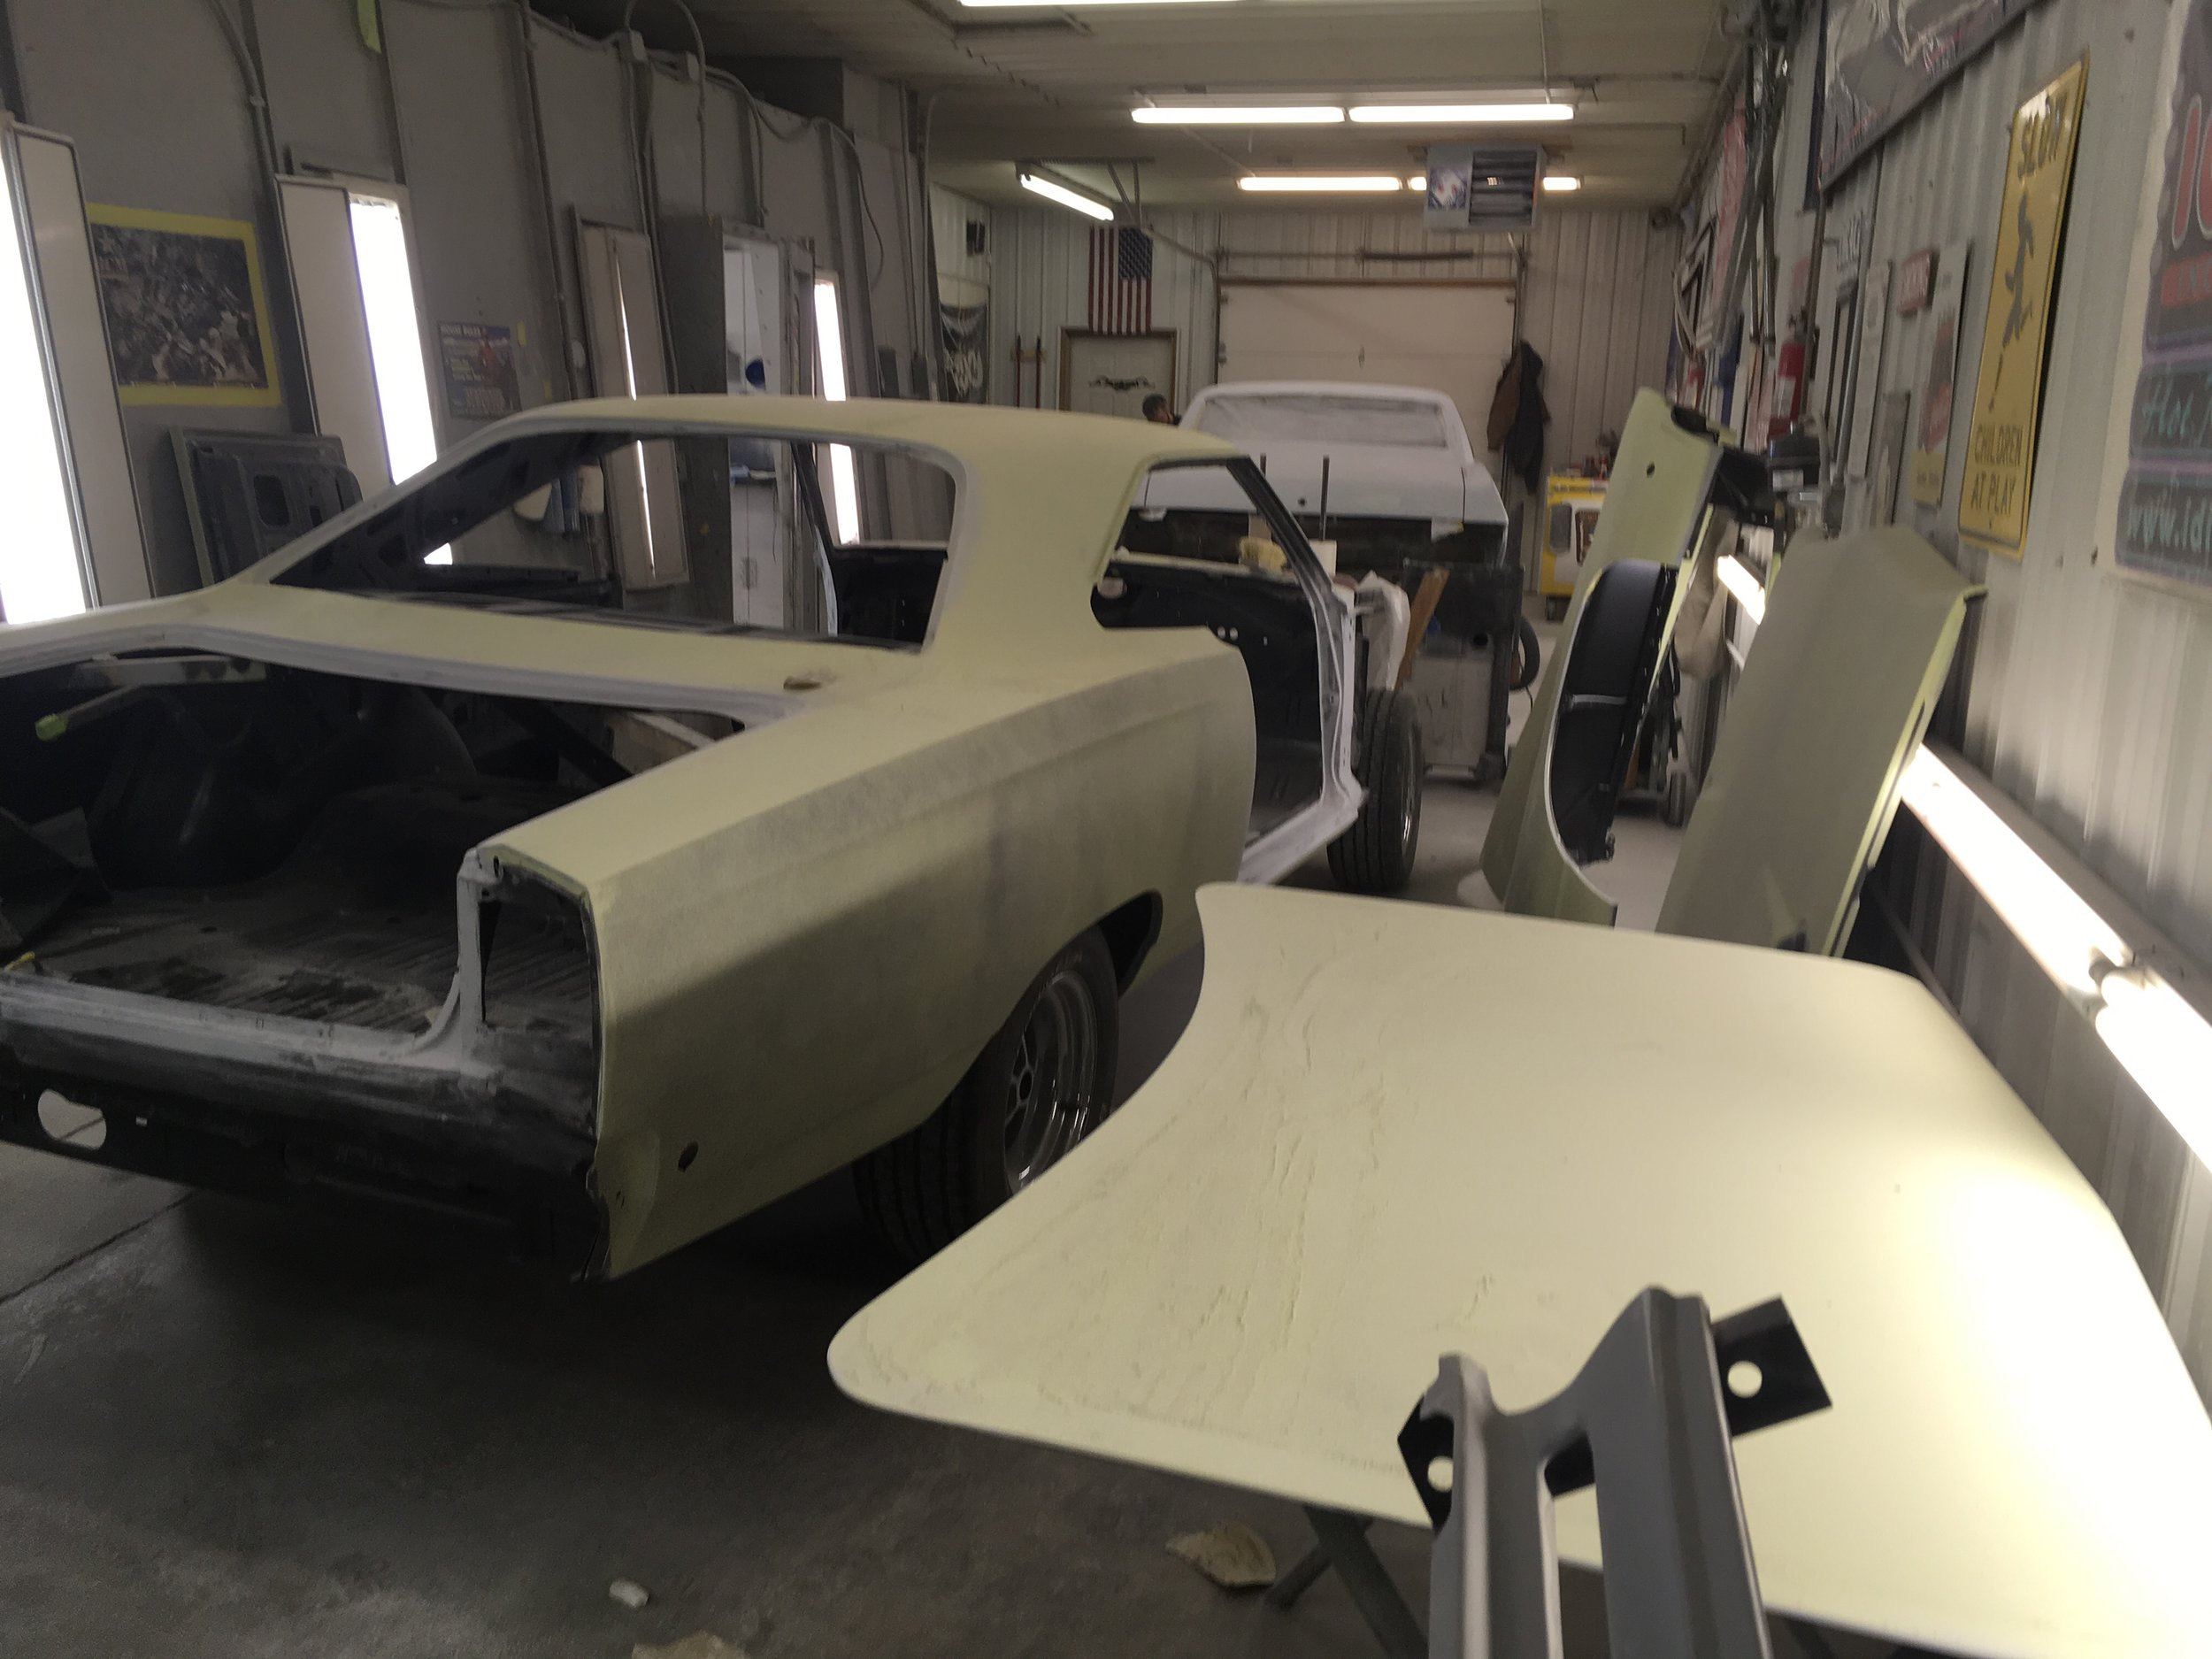 1968-Plymouth-GTX-minneapolis-custom-built-hot-rod-restoration-painting-and-sanding.jpg